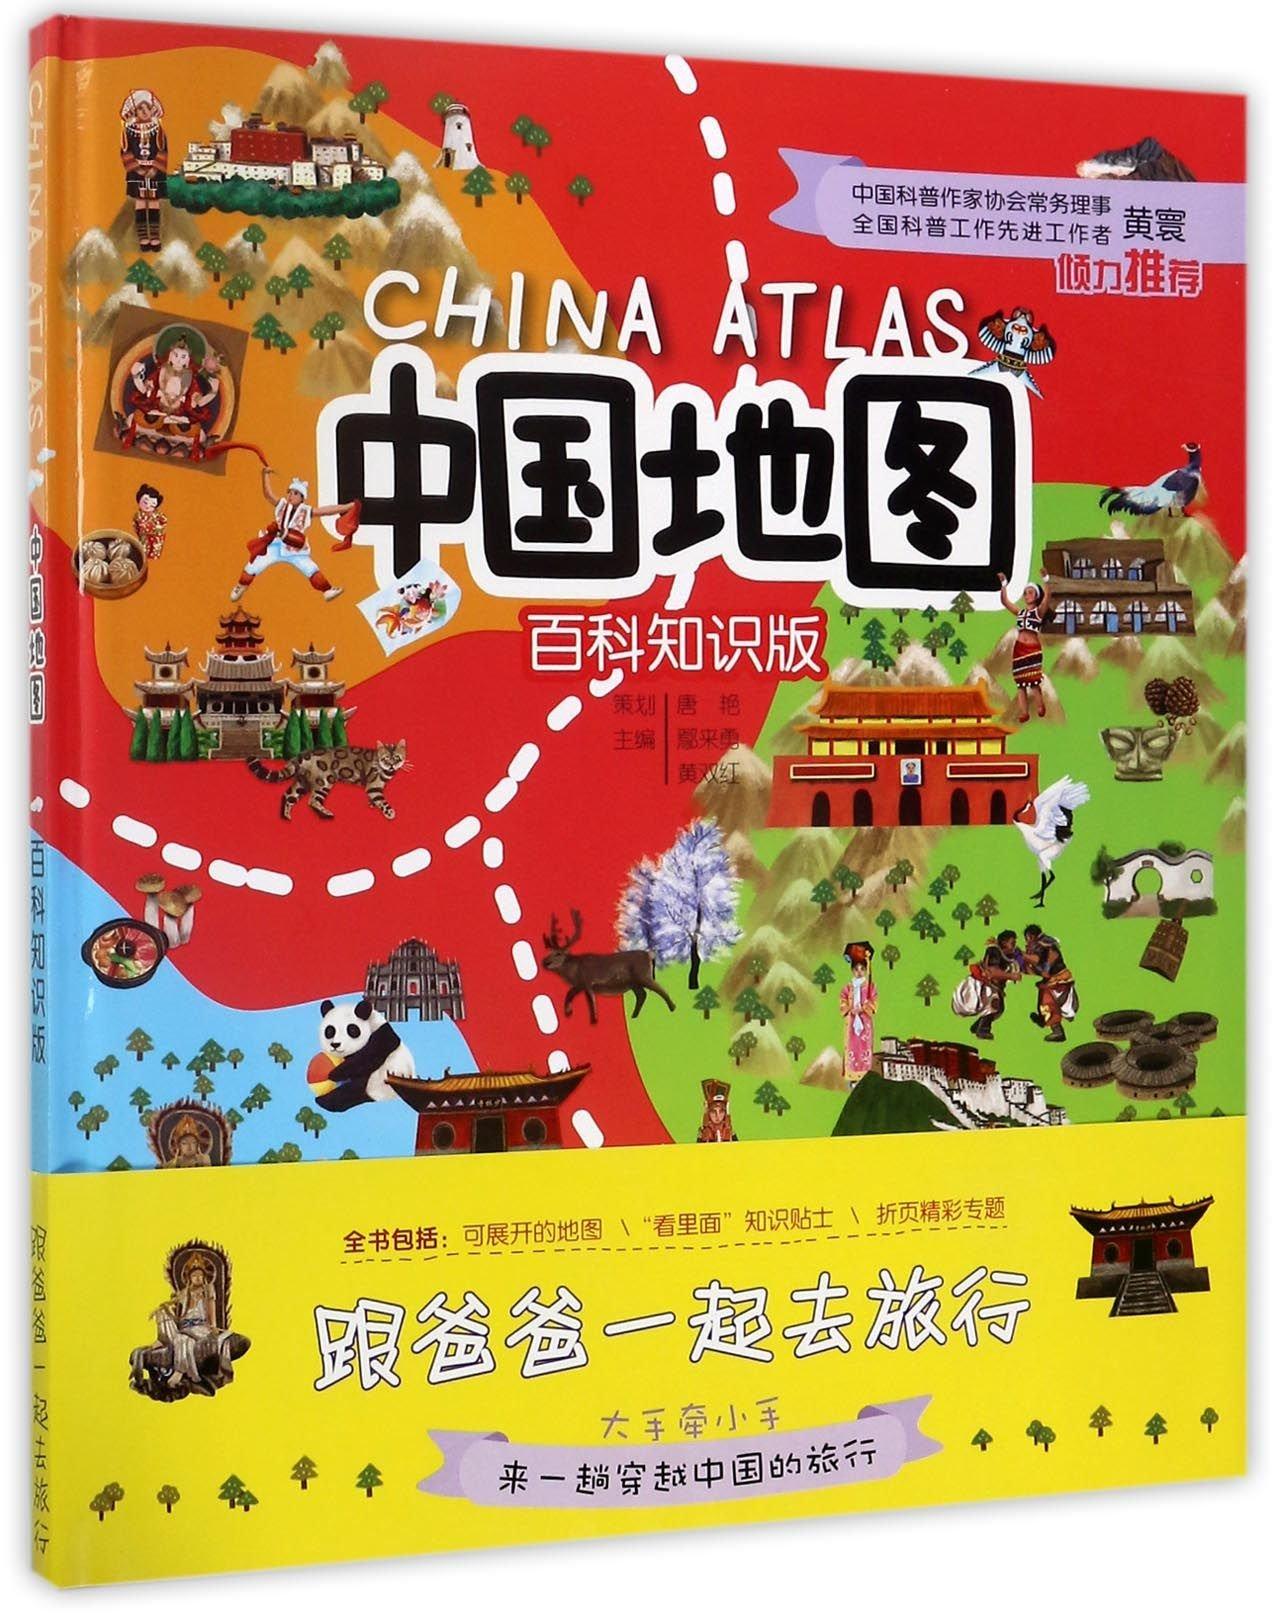 China Map (Encyclopedia Edition) (Hardcover) (Chinese Edition) pdf